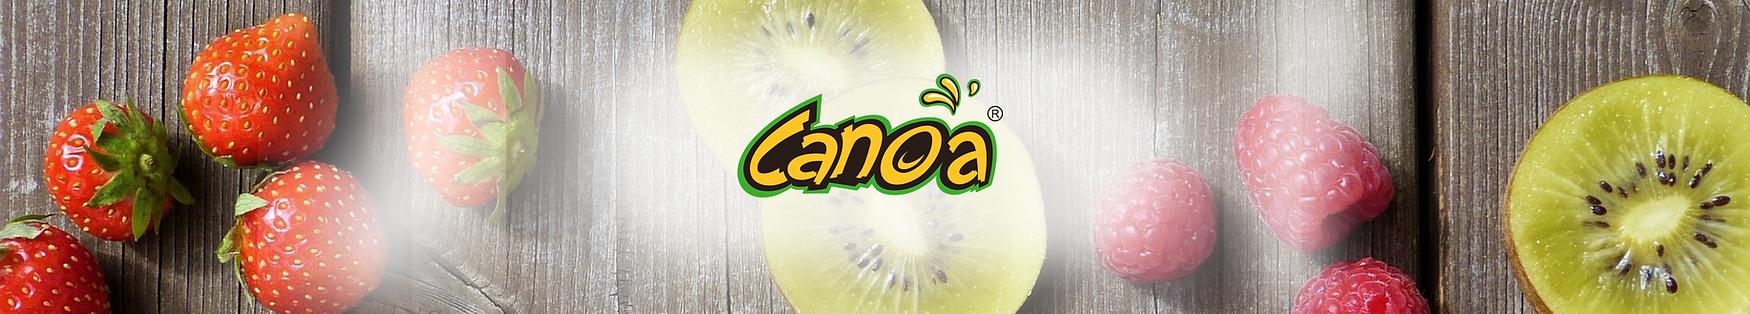 CANOA - PG WEB2-01.png